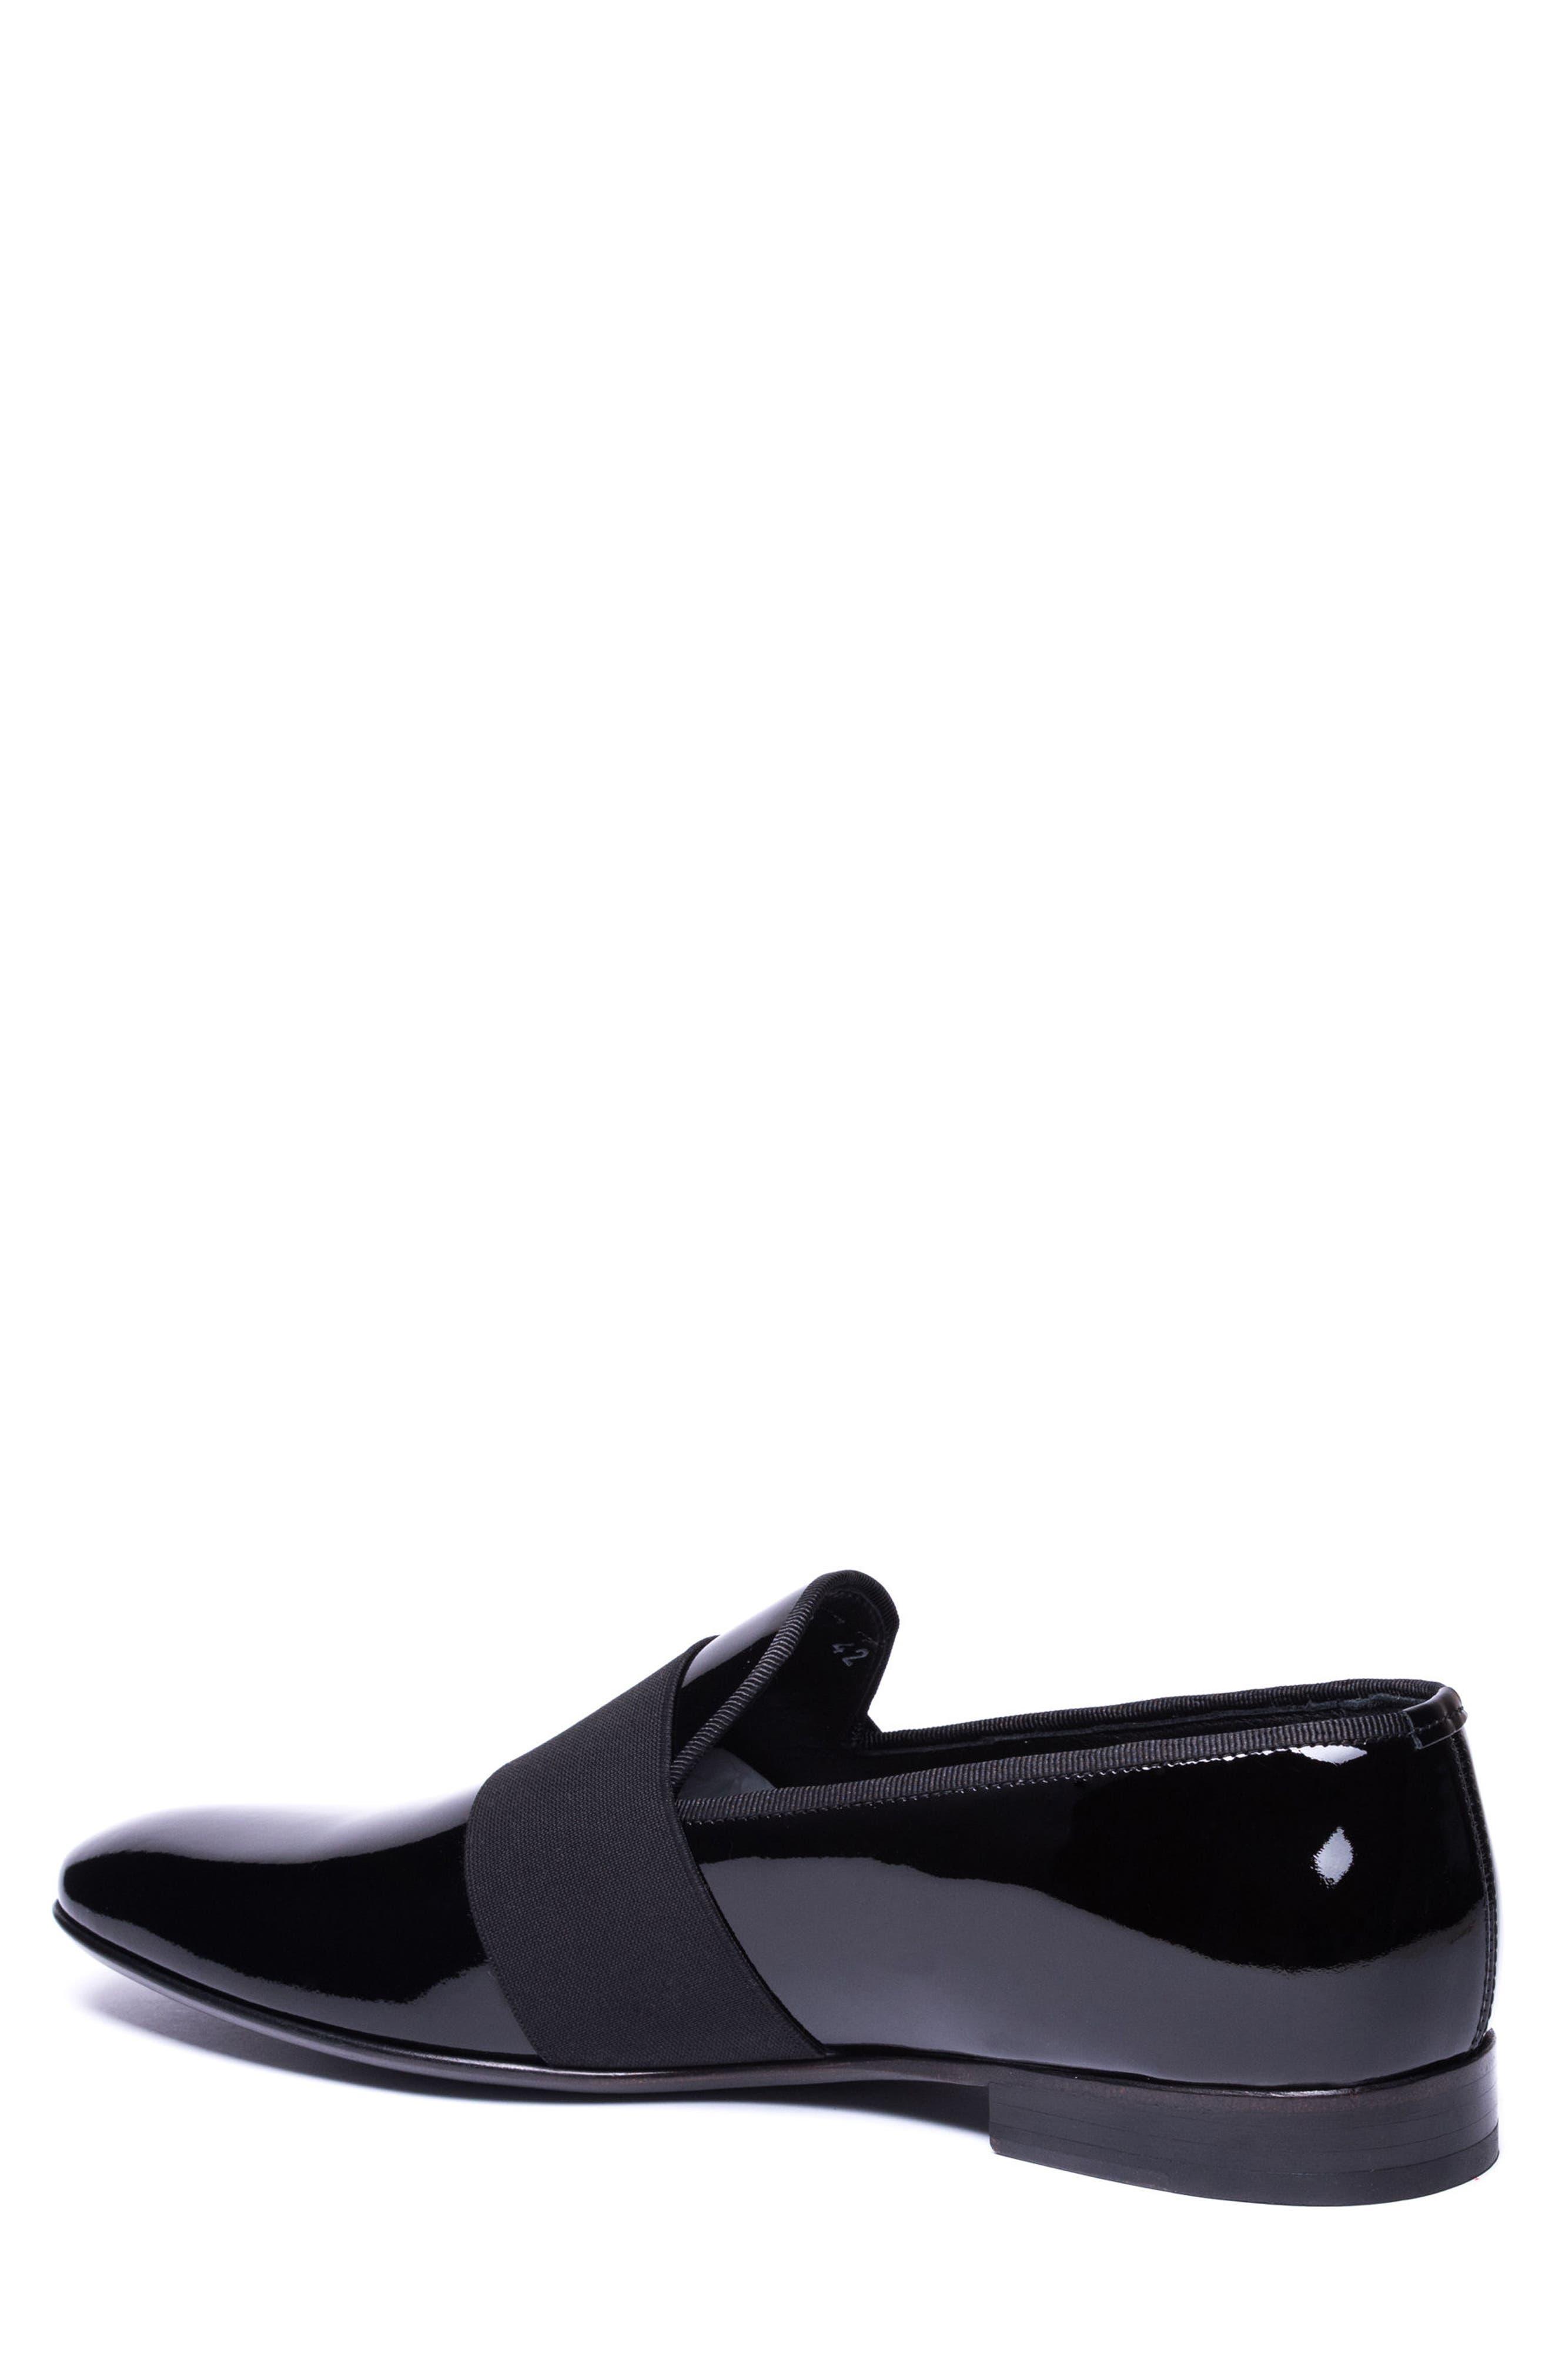 Alessandro Banded Venetian Loafer,                             Alternate thumbnail 2, color,                             BLACK LEATHER